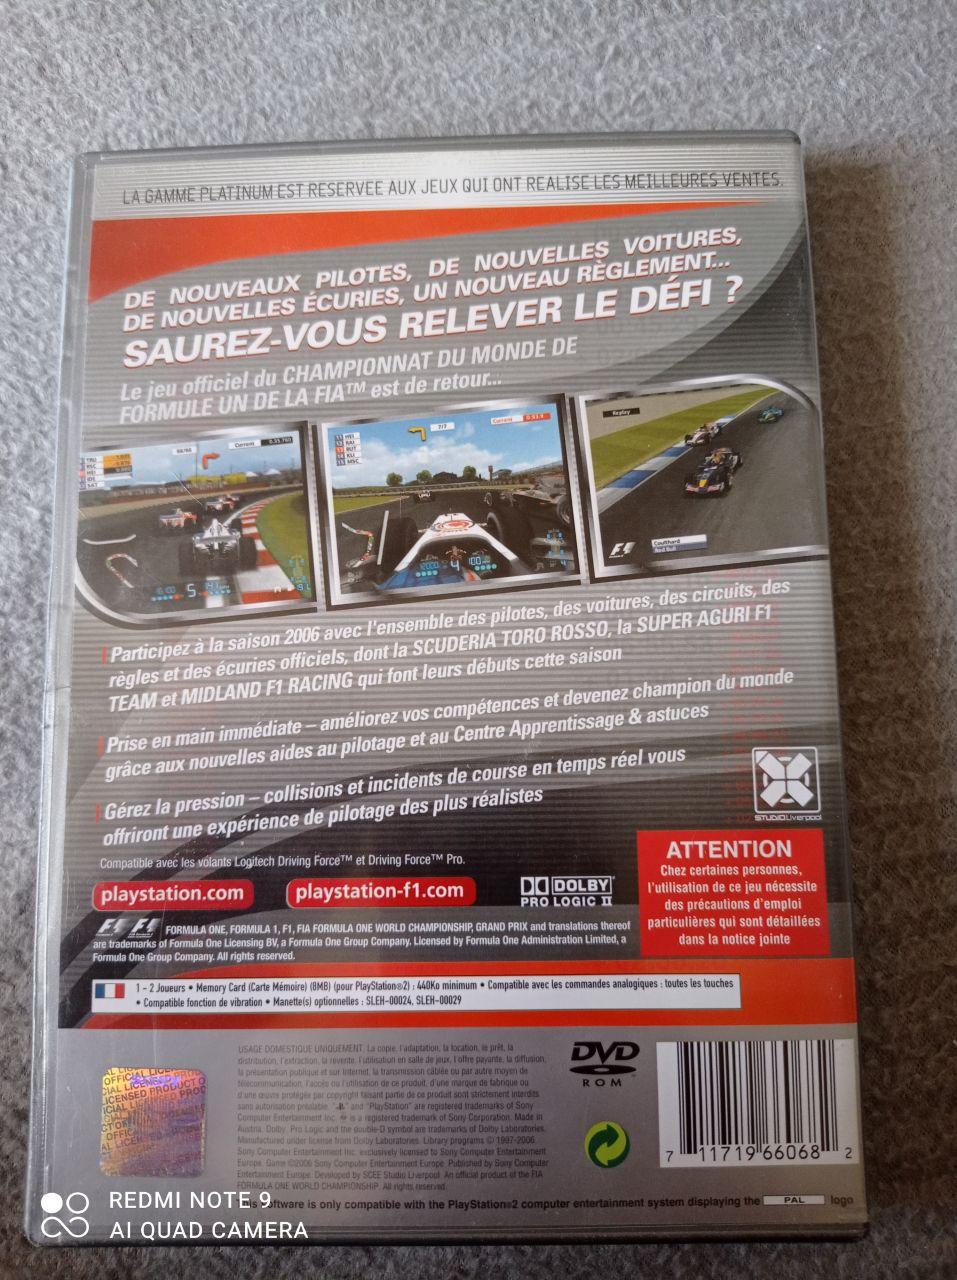 Image article Sony - Playstation 2 - Formula one 06